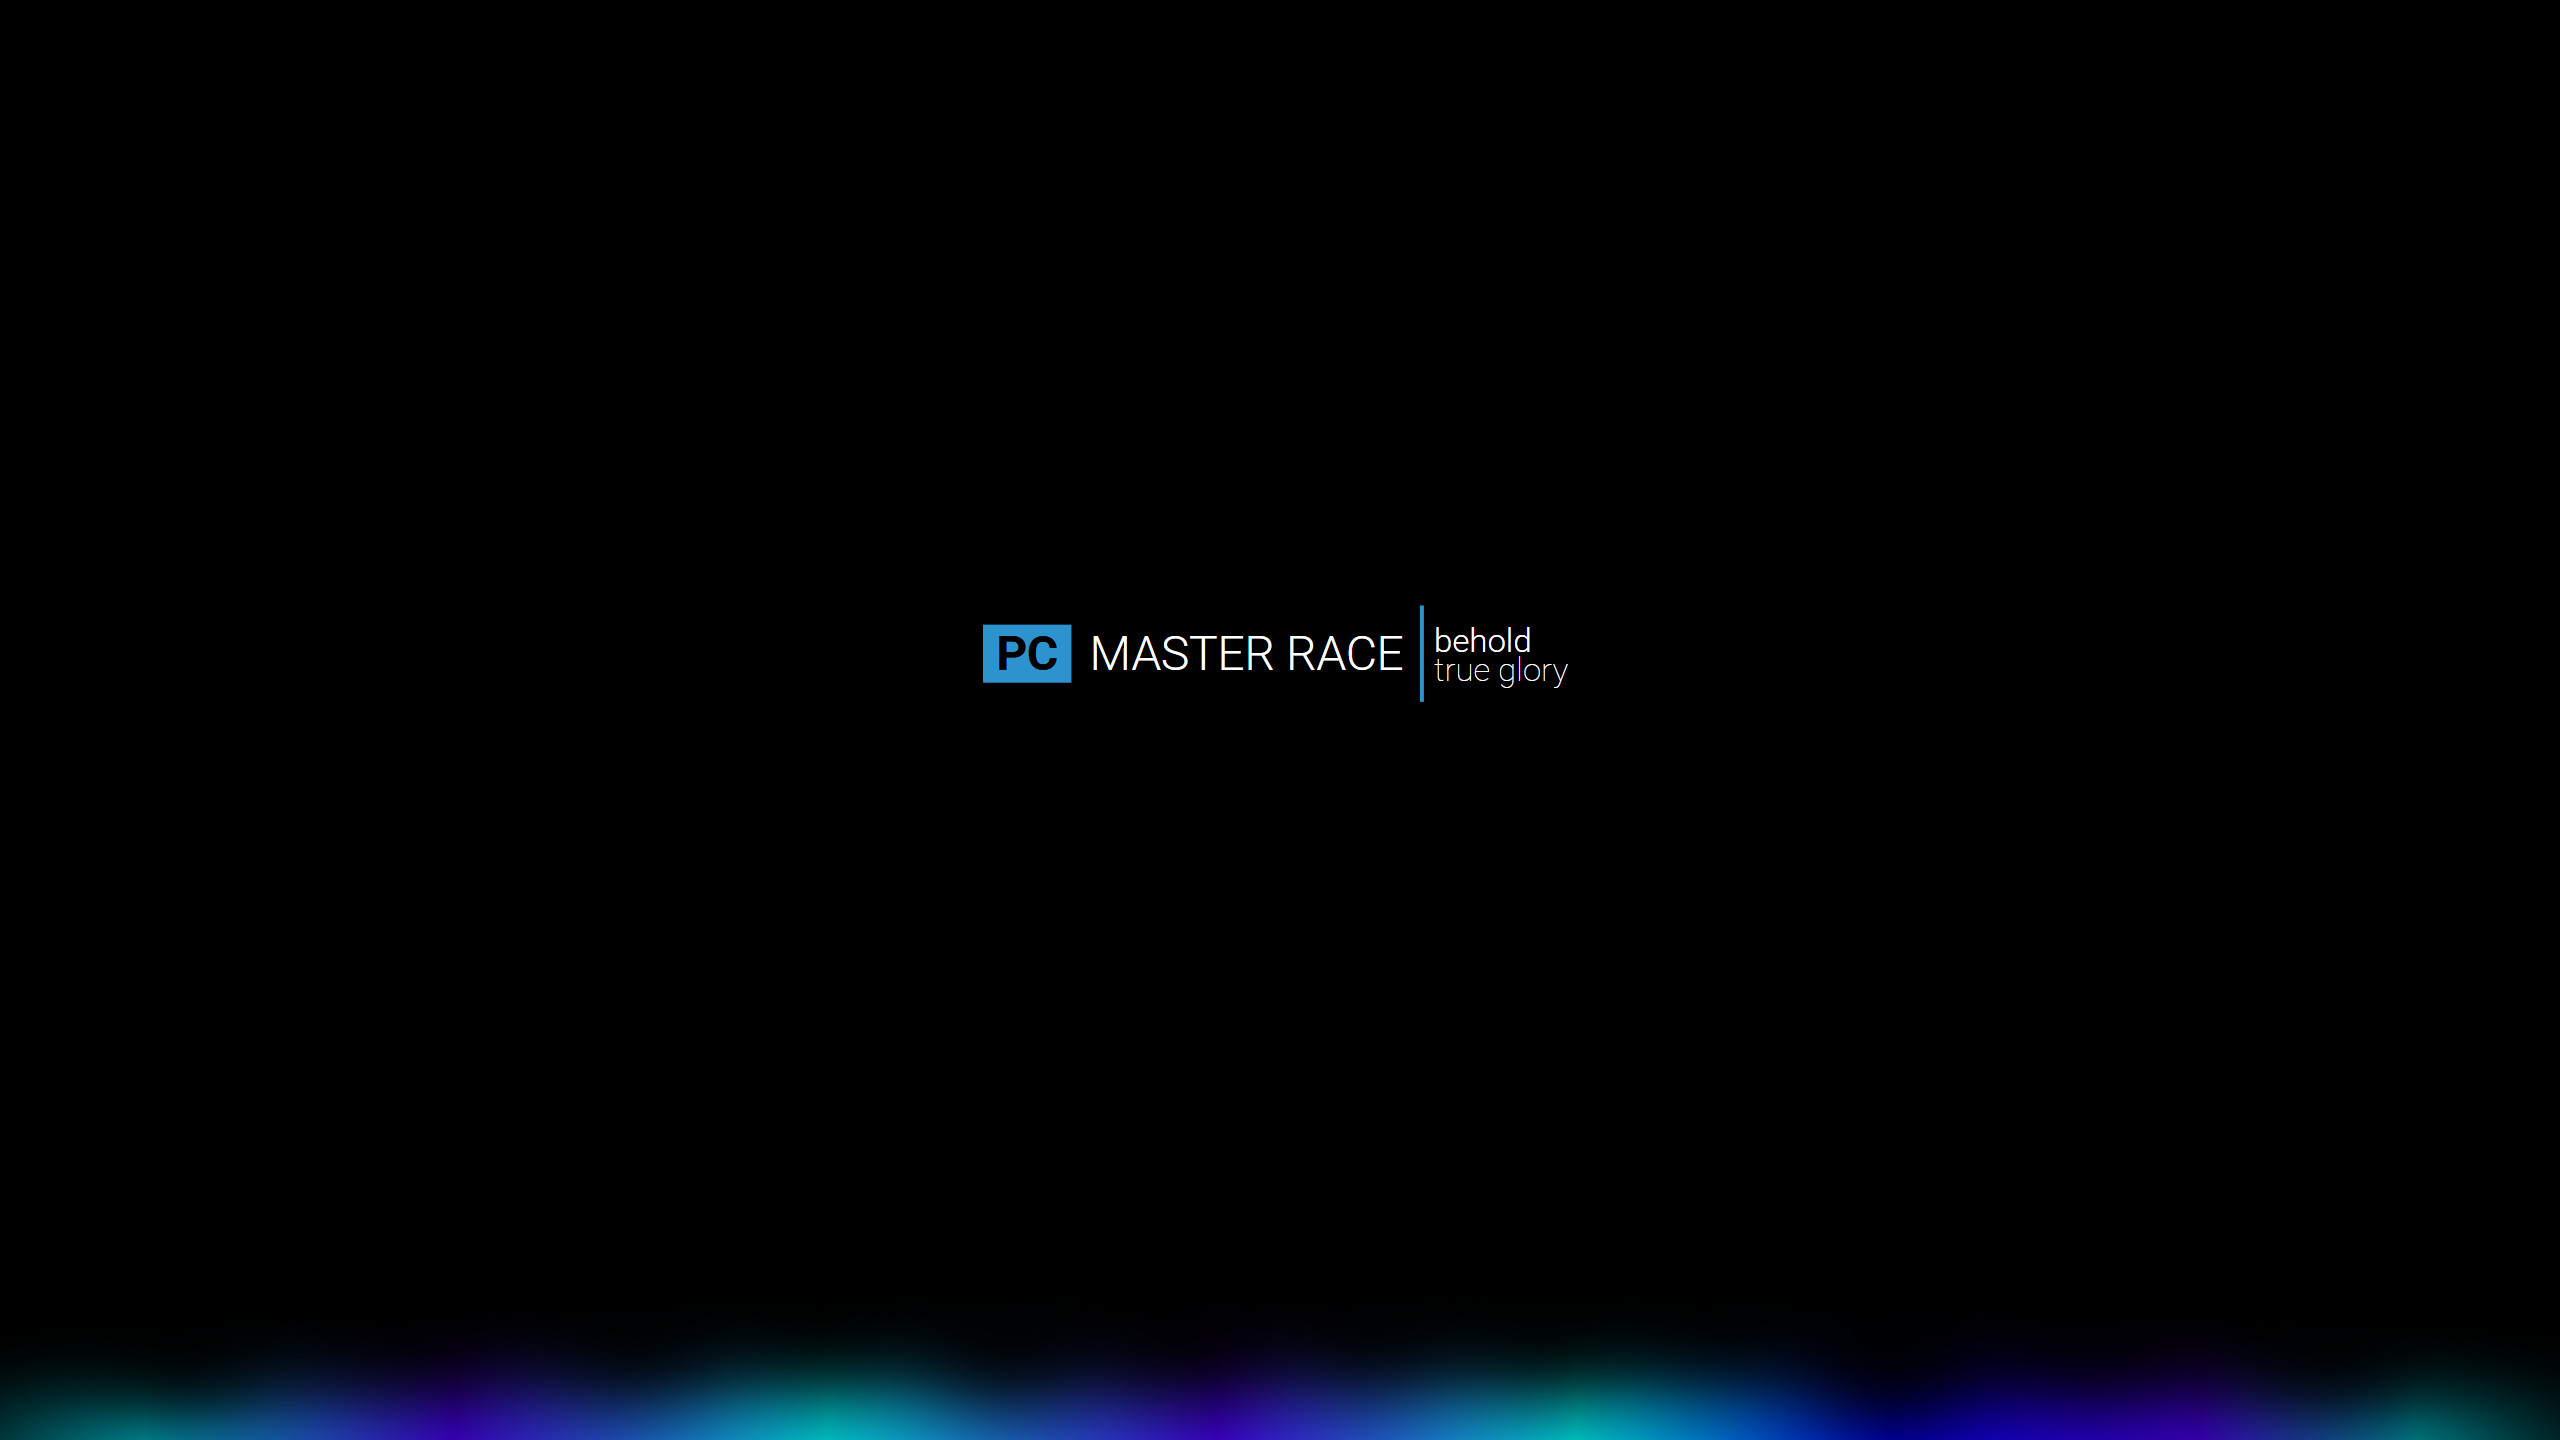 General PC Master Race dark